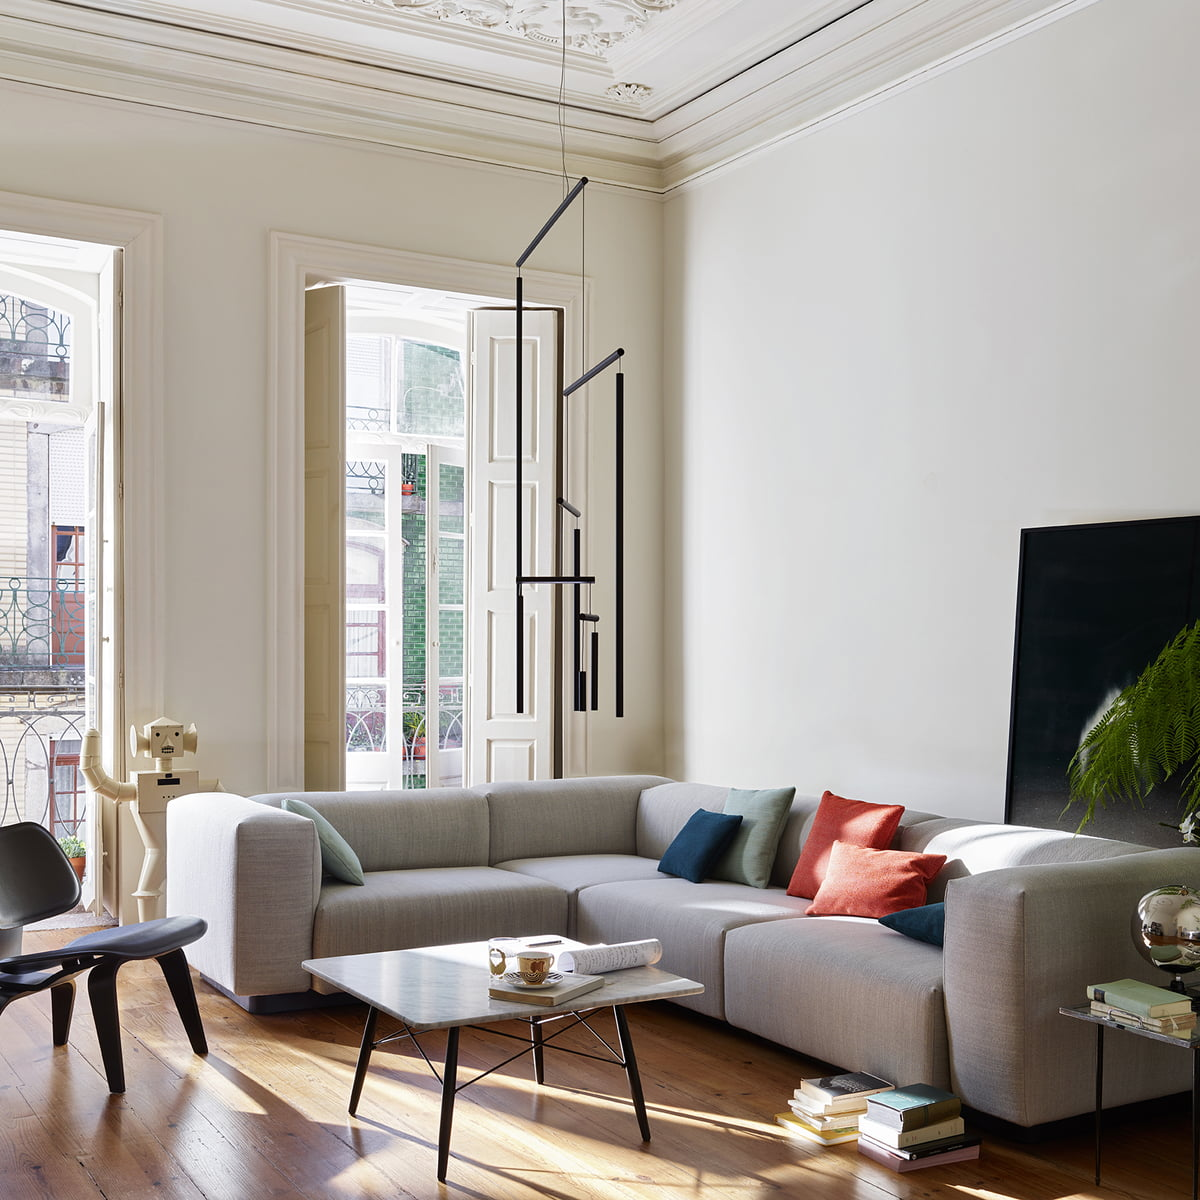 Buy The Soft Modular Corner Sofa From Vitra